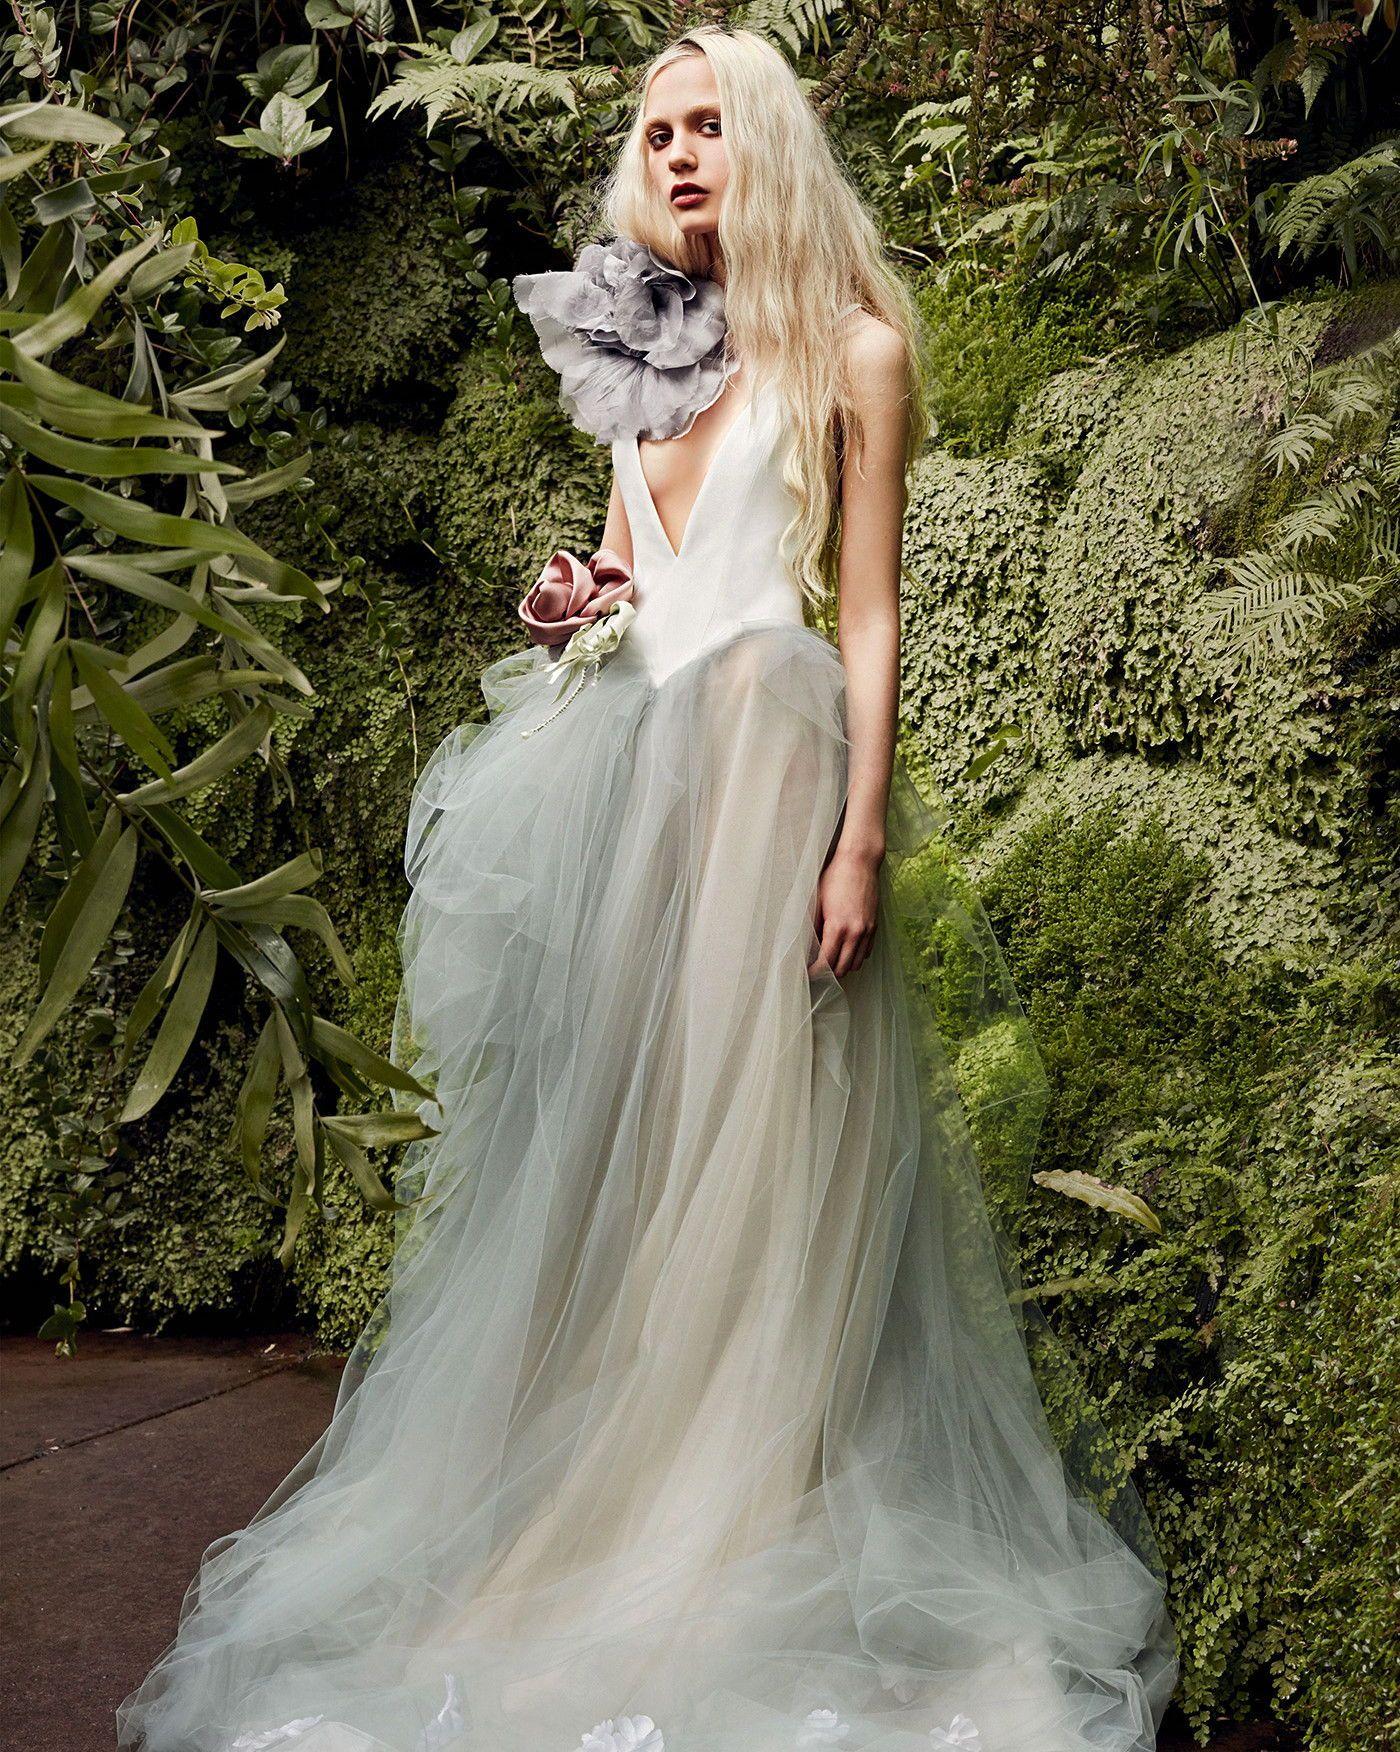 Vera Wang Spring 2020 Larkspure Sleeveless A Line Wedding Dress With V Neckline Blue Gray Tu Vera Wang Bridal Wedding Dresses Vera Wang Bridal Fashion Week [ 1752 x 1400 Pixel ]